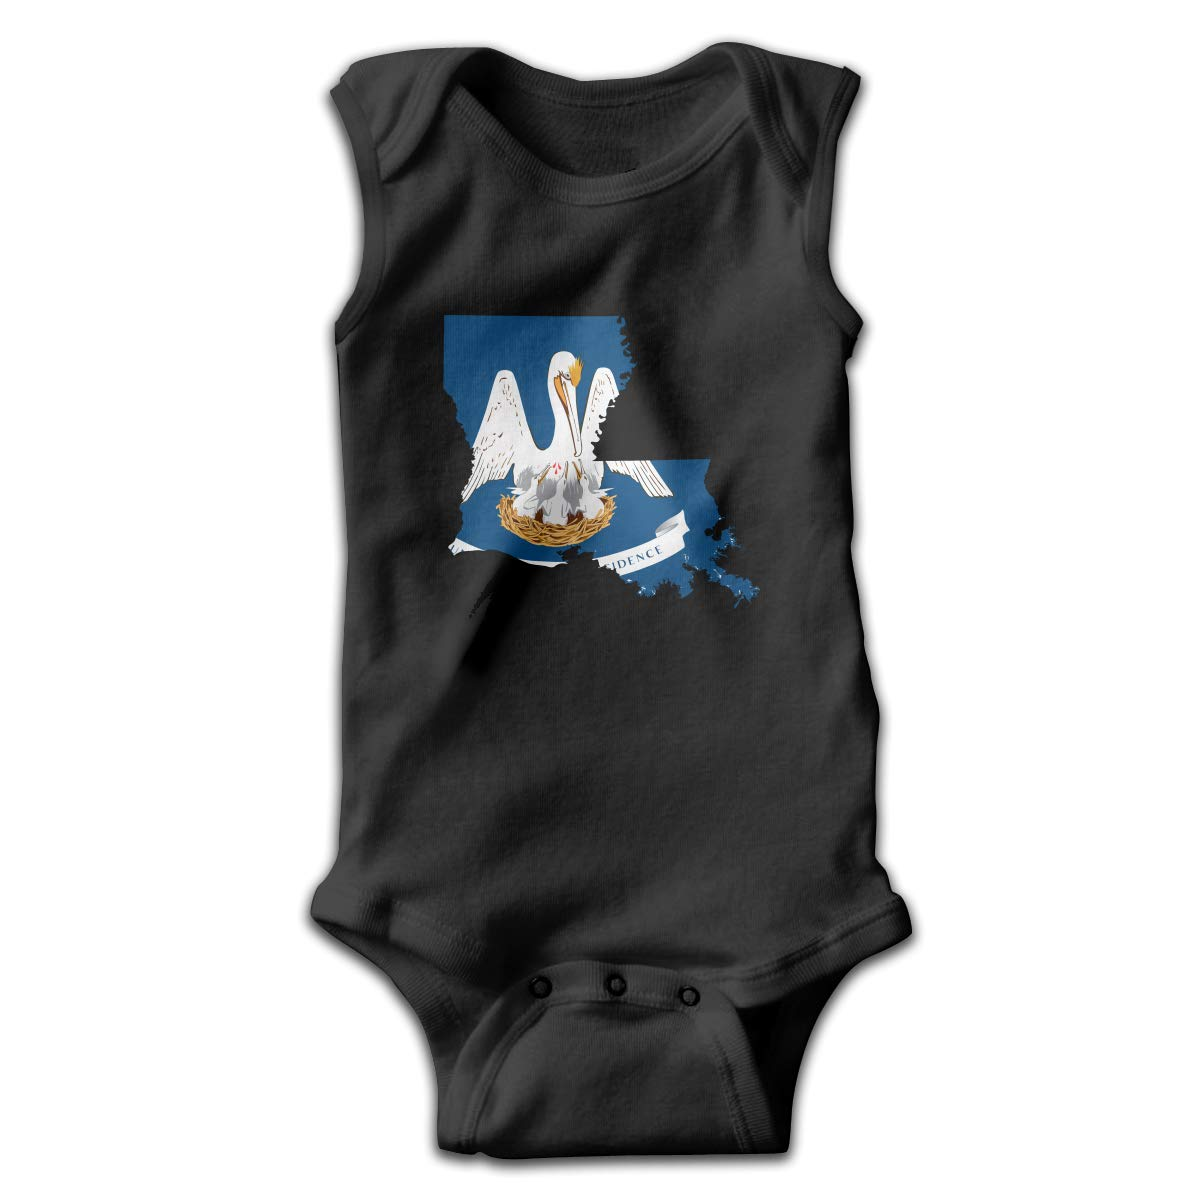 Dunpaiaa Louisiana State Flag Smalls Baby Onesie,Infant Bodysuit Black